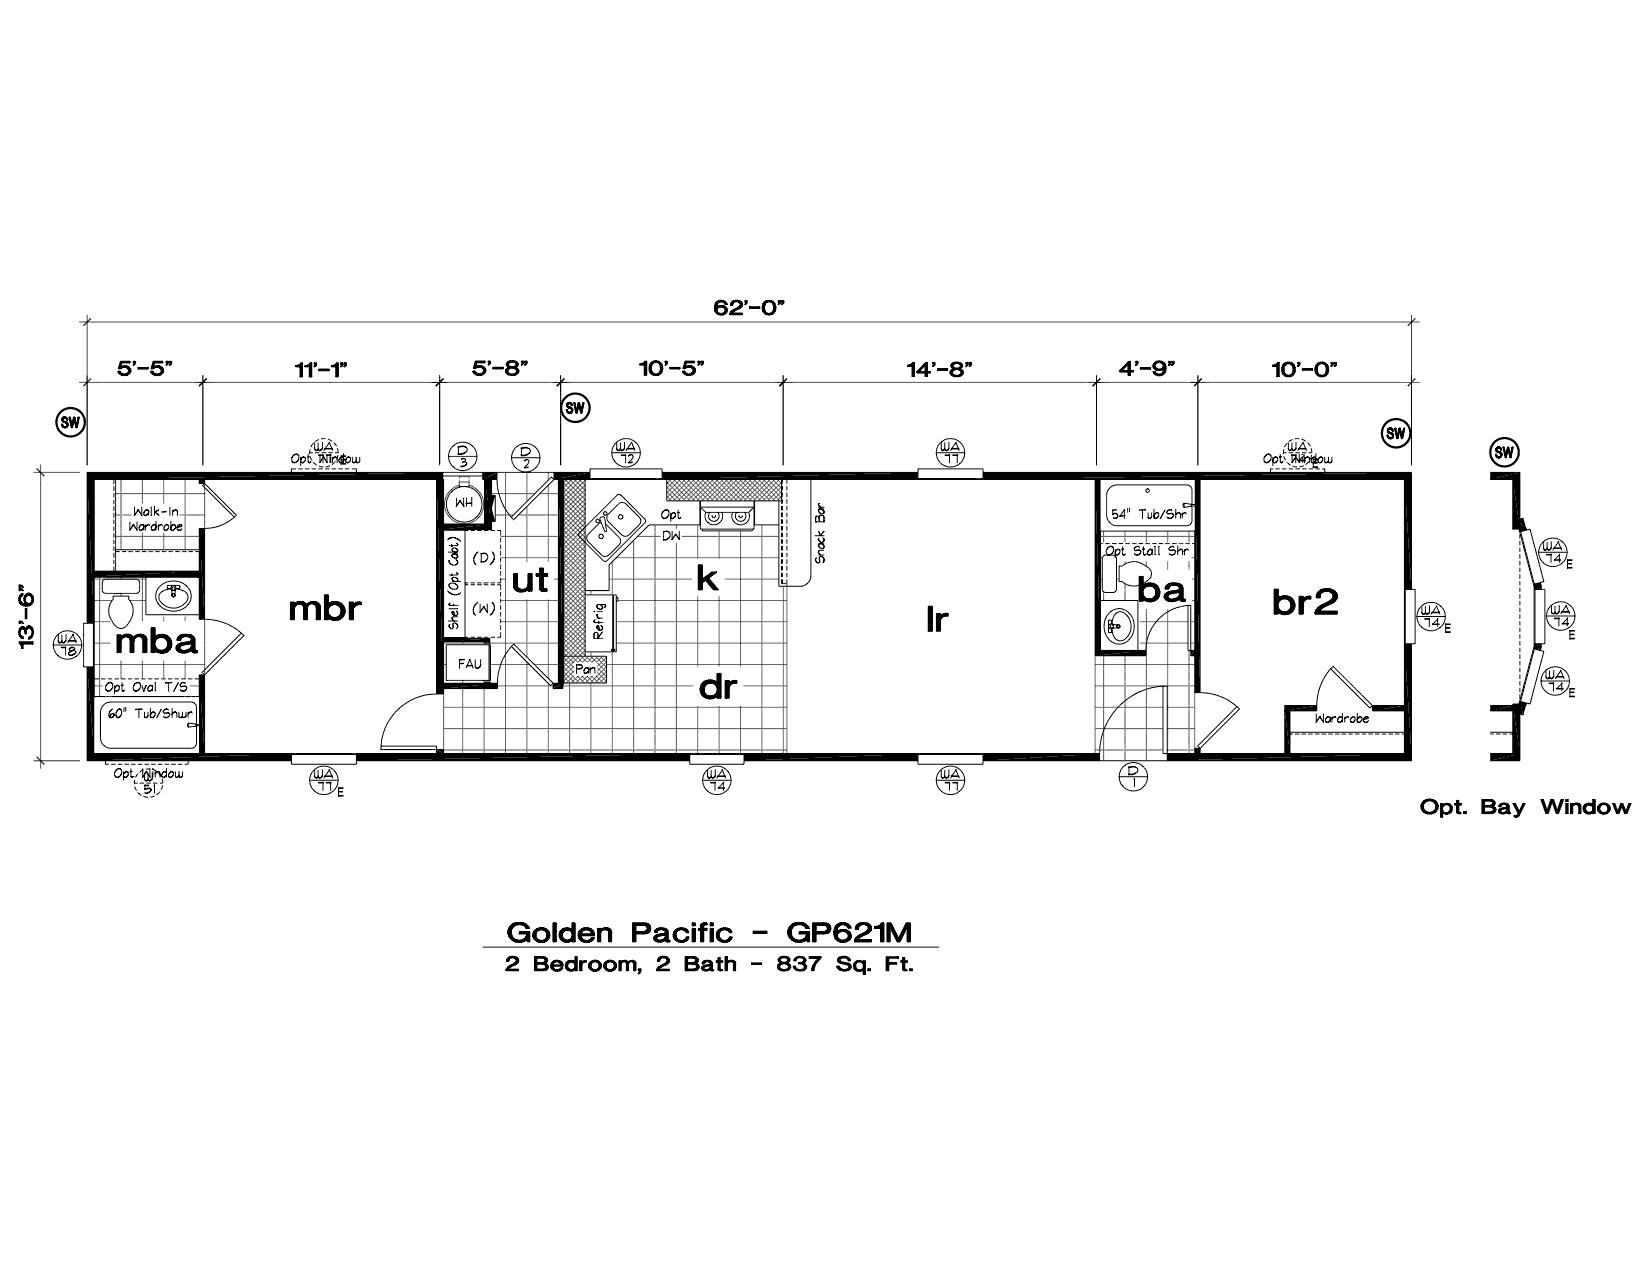 oakwood mobile home floor plans single wide 2